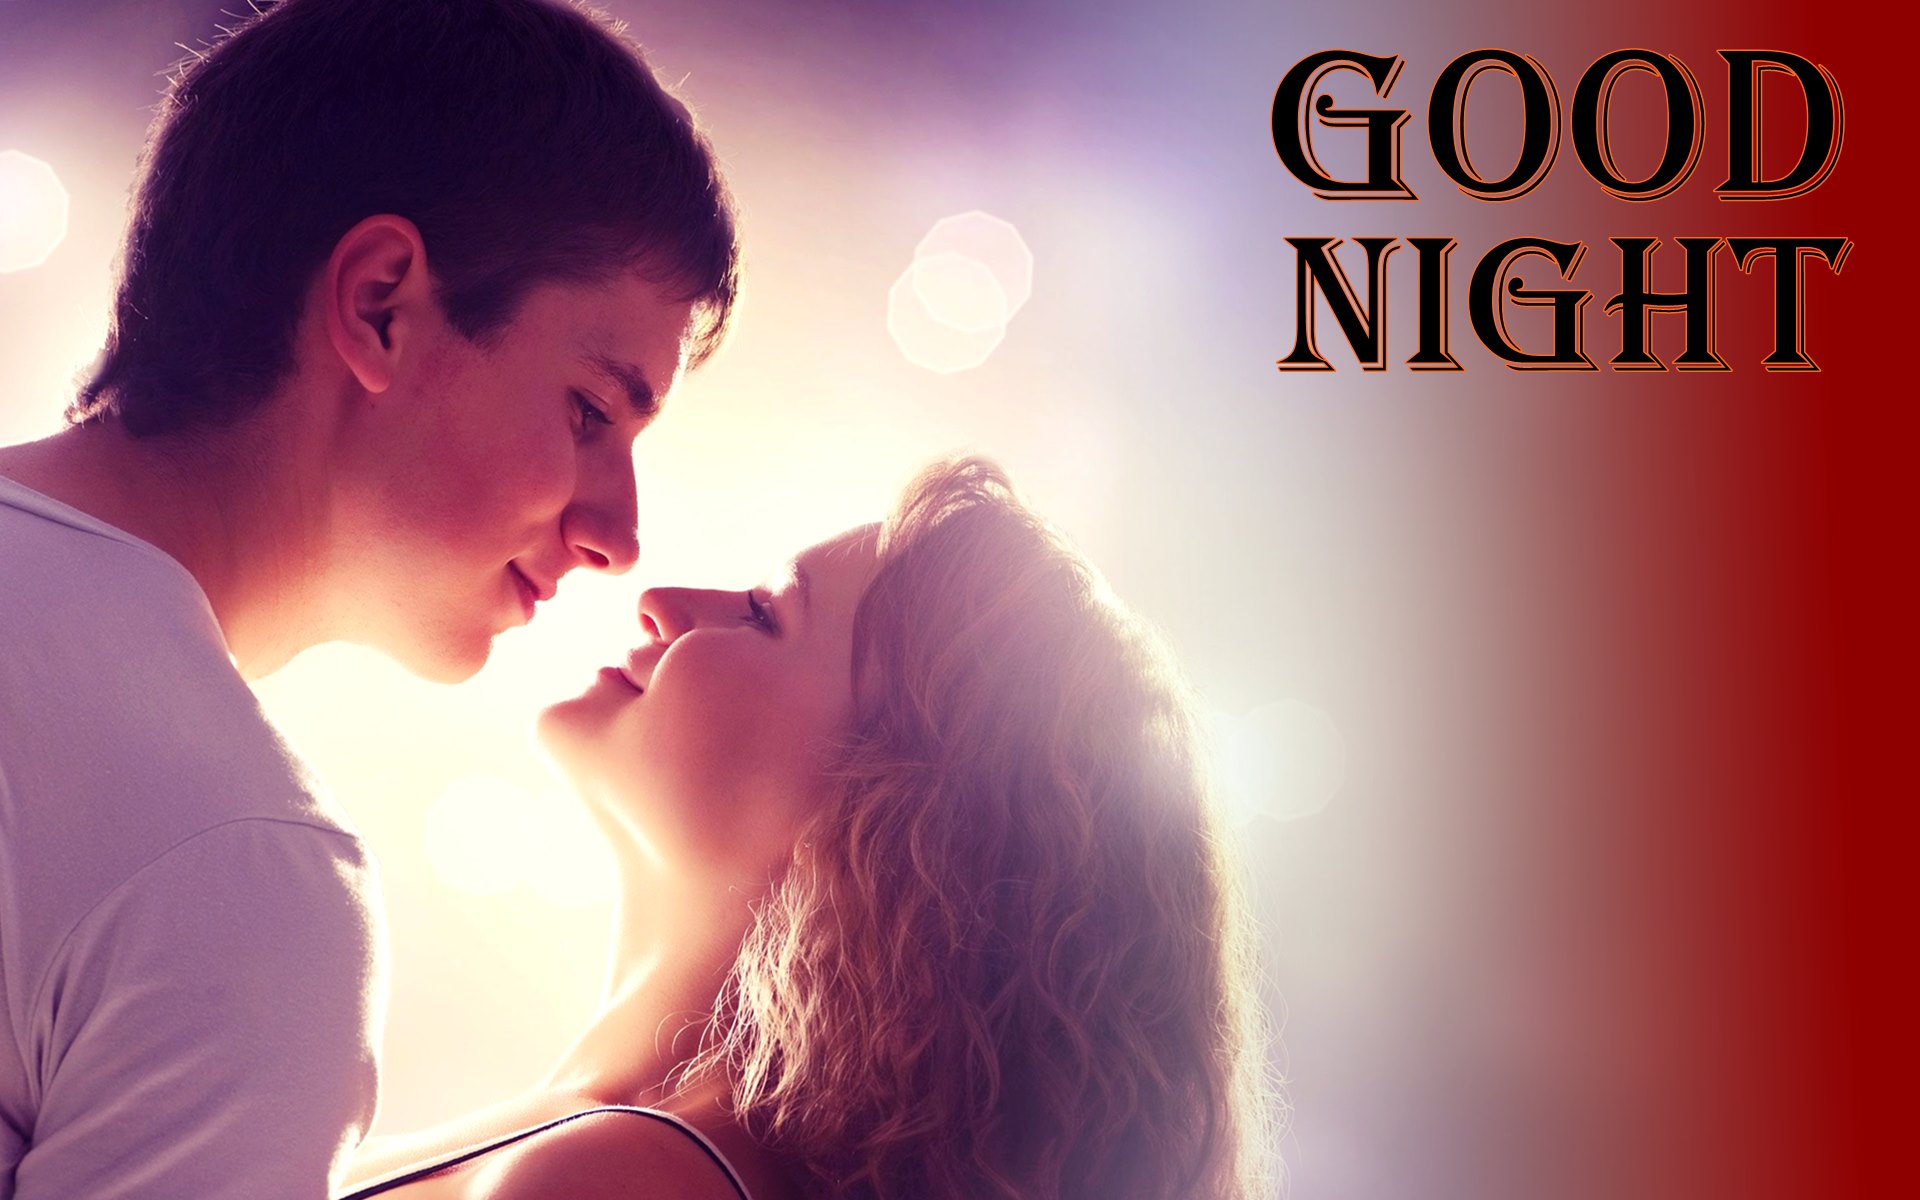 Romantic Love Good Night - HD Wallpaper